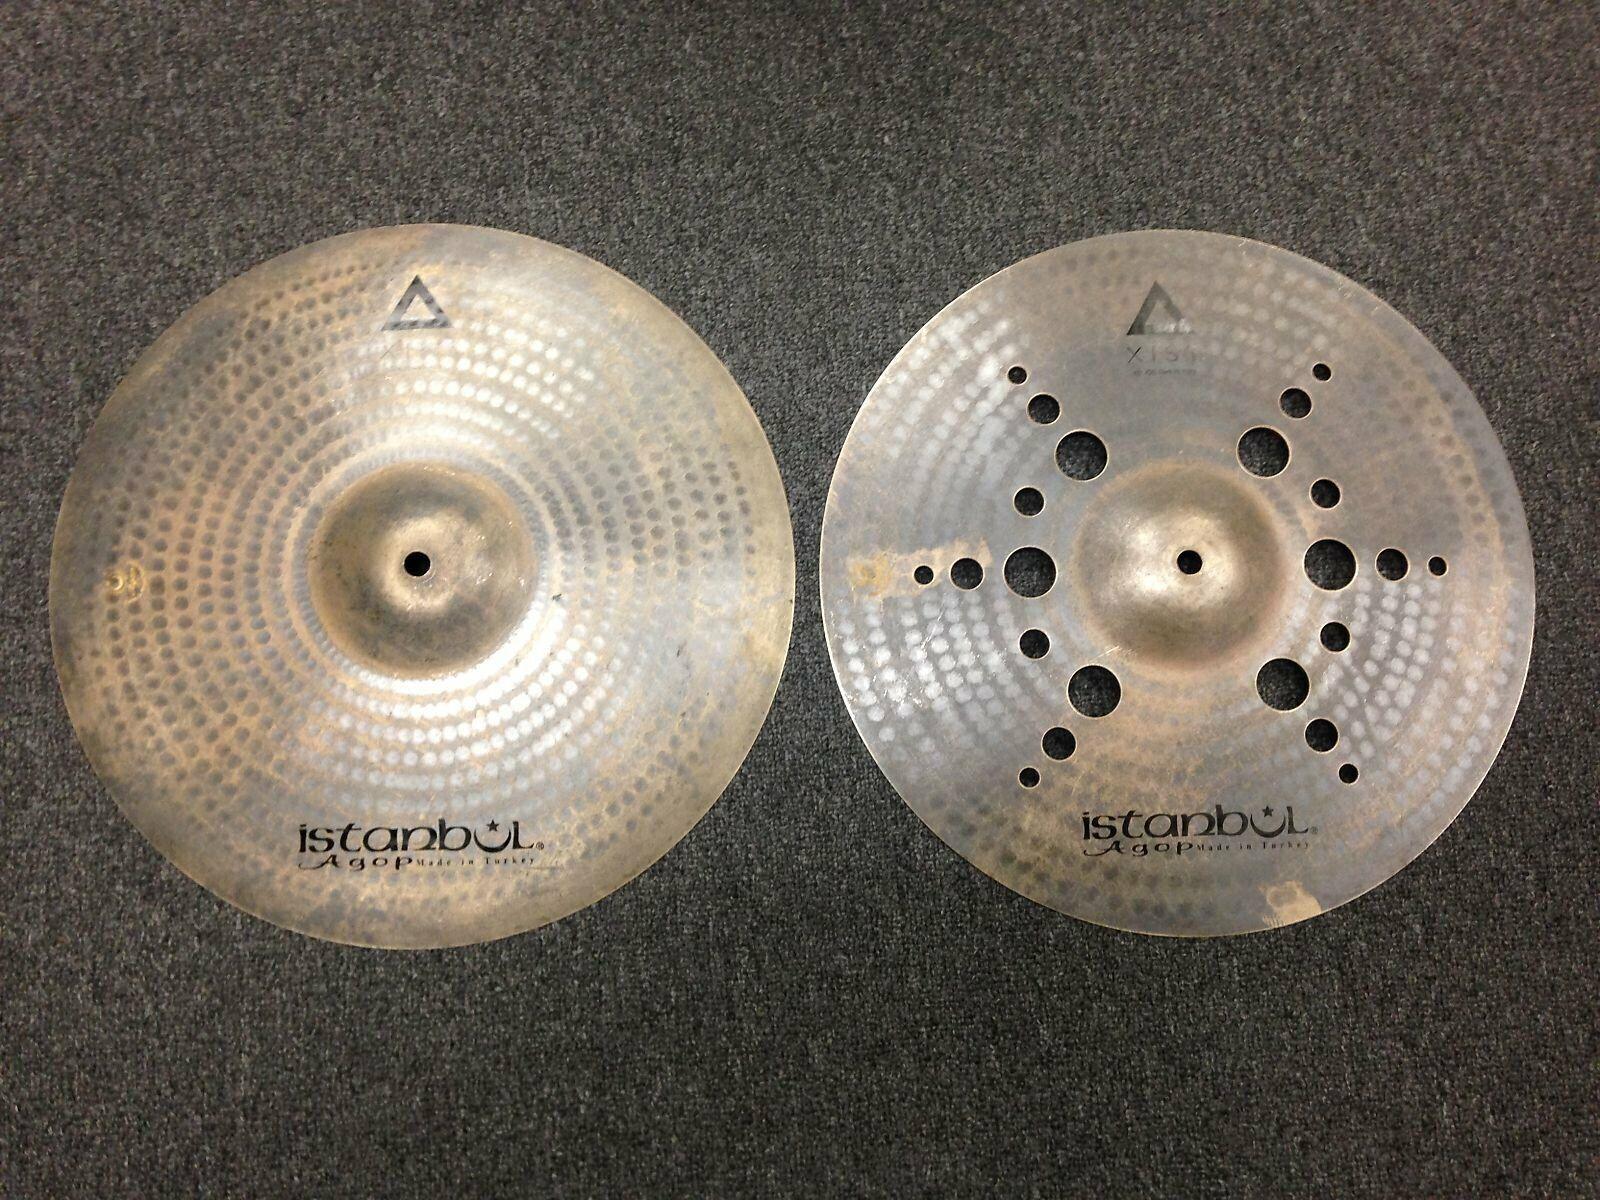 Istanbul Agop 15  Xist Ion Dark Hi-Hat Cymbals (Pair)